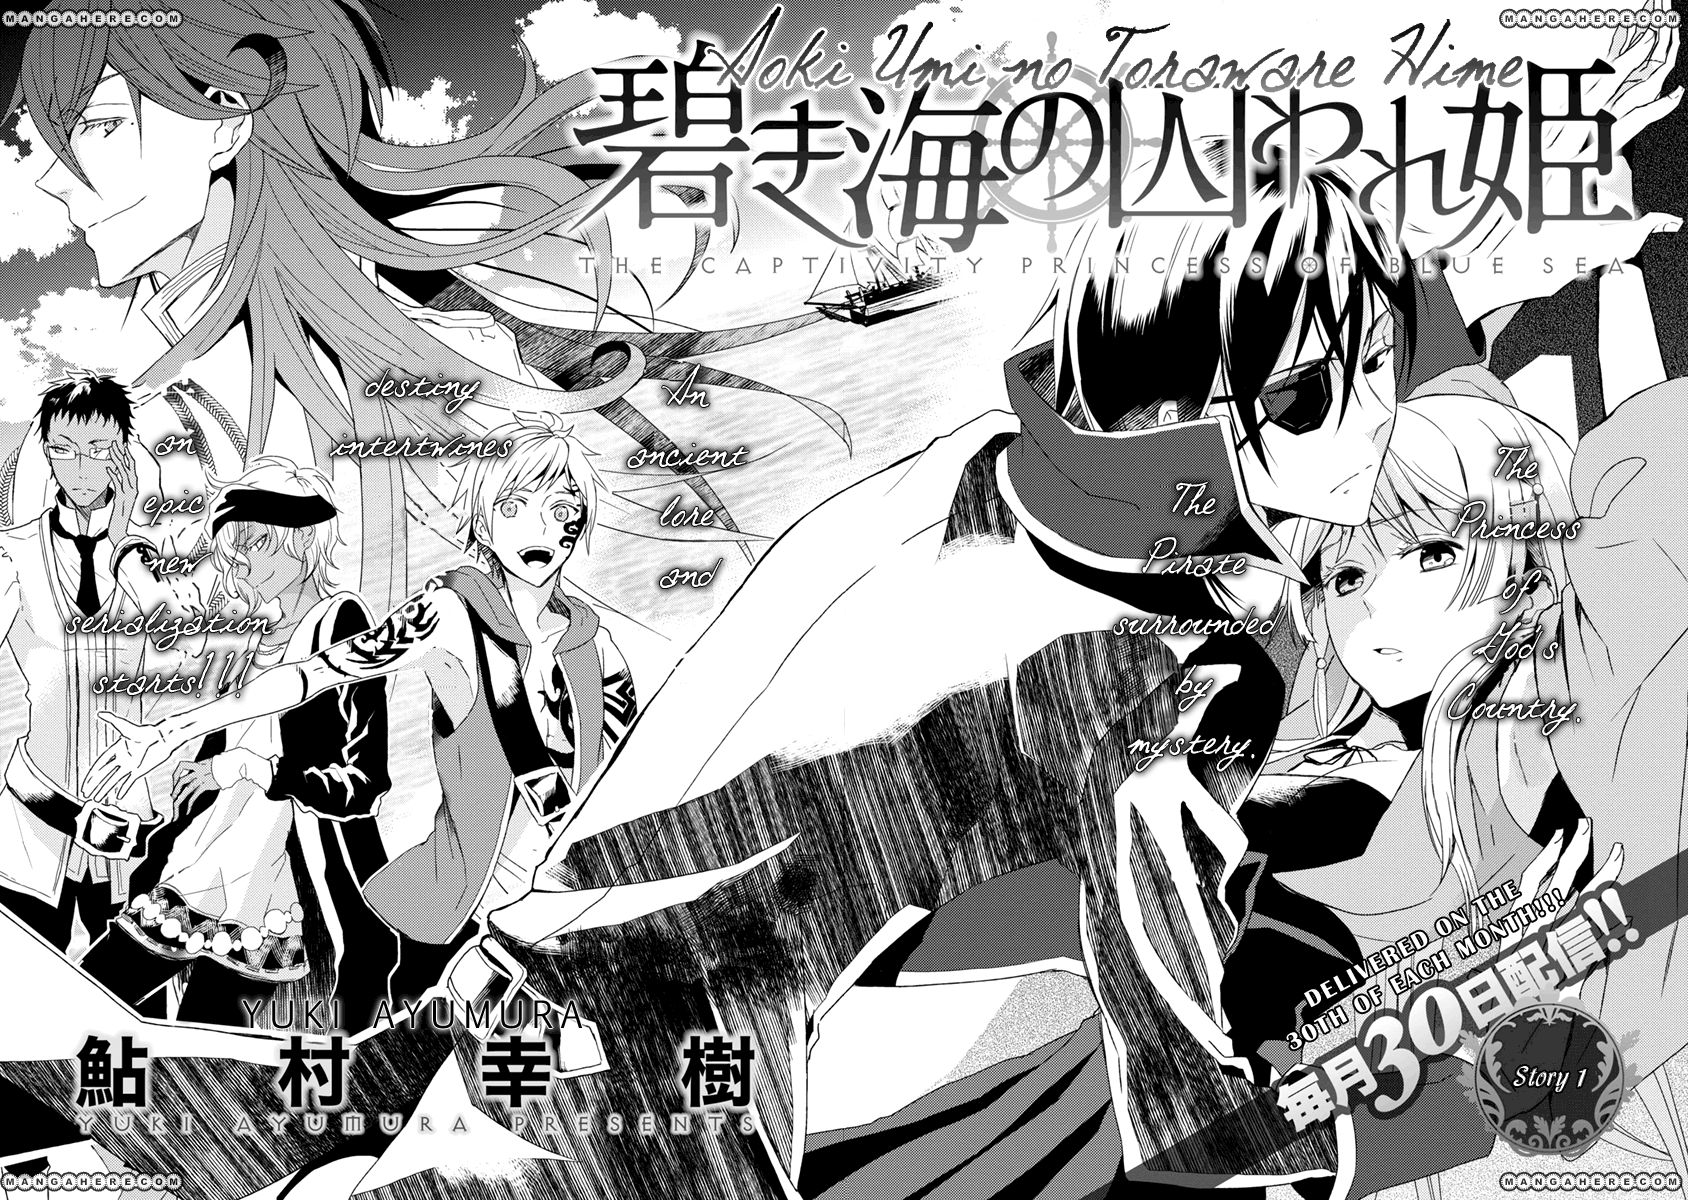 Aoki Umi no Toraware Hime 1 Page 3